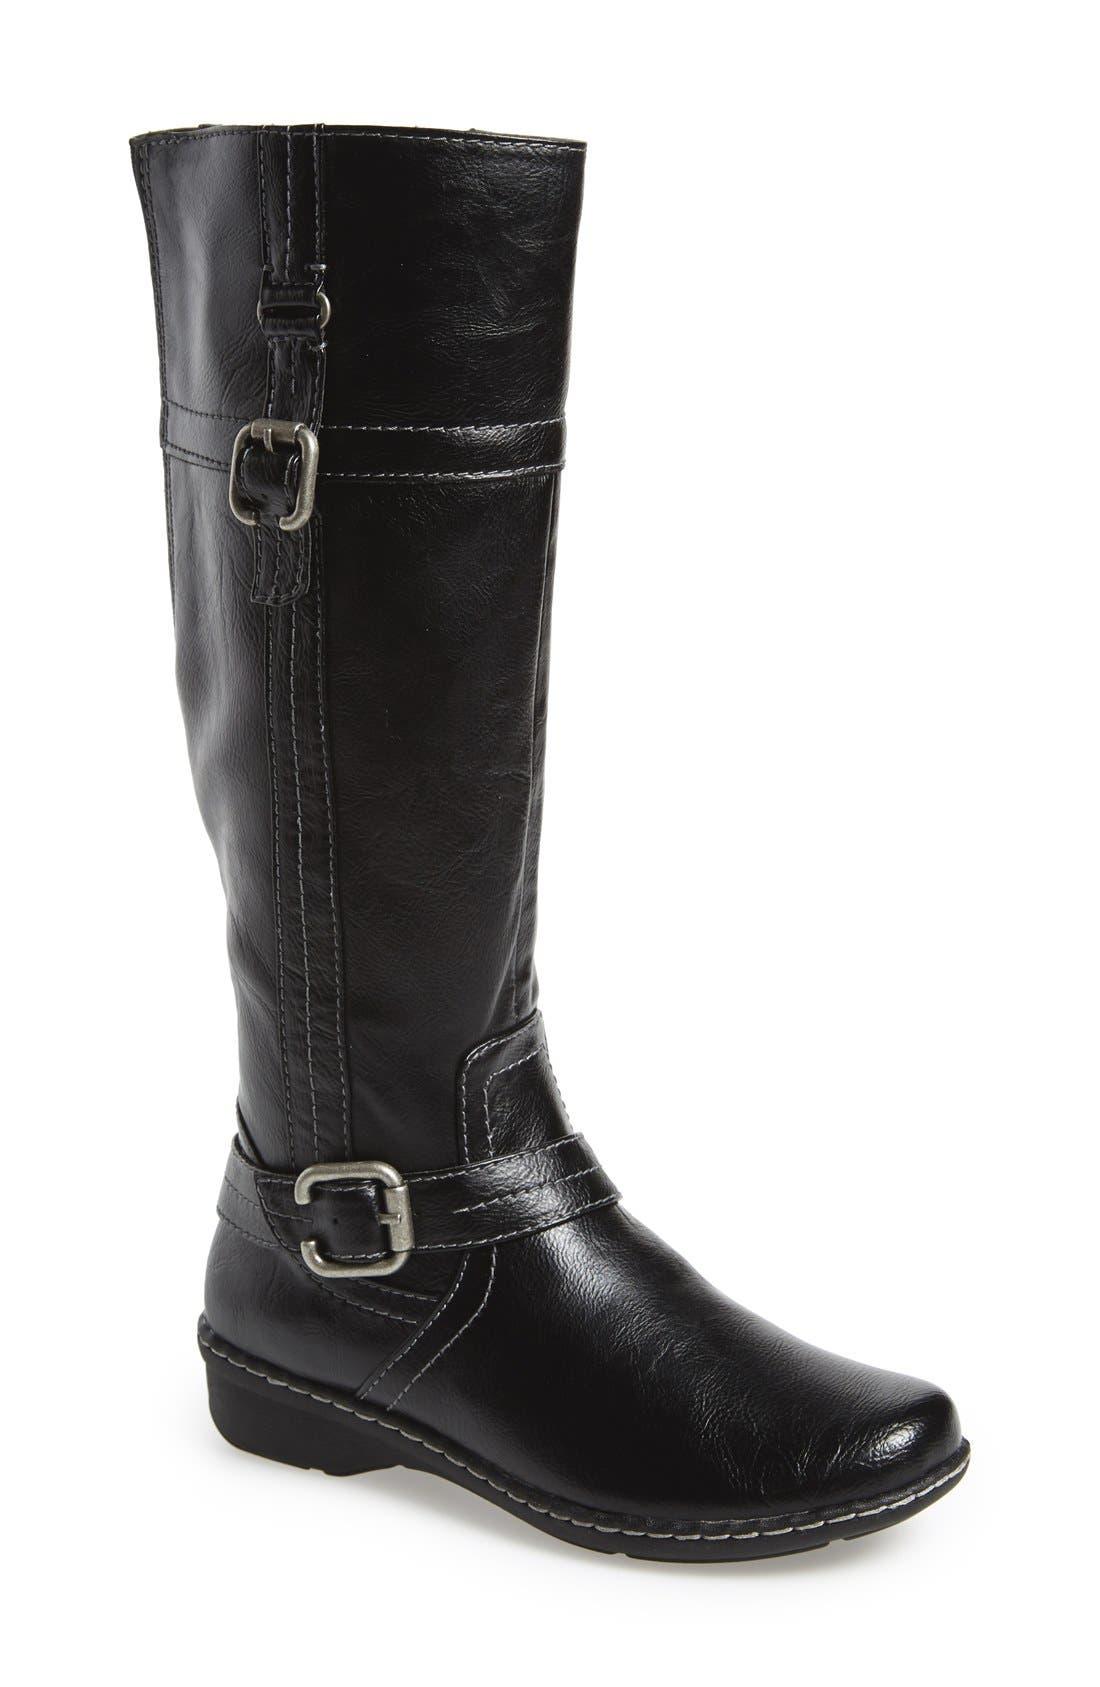 Alternate Image 1 Selected - Naturalizer'Renna' Knee High Boot (Women)